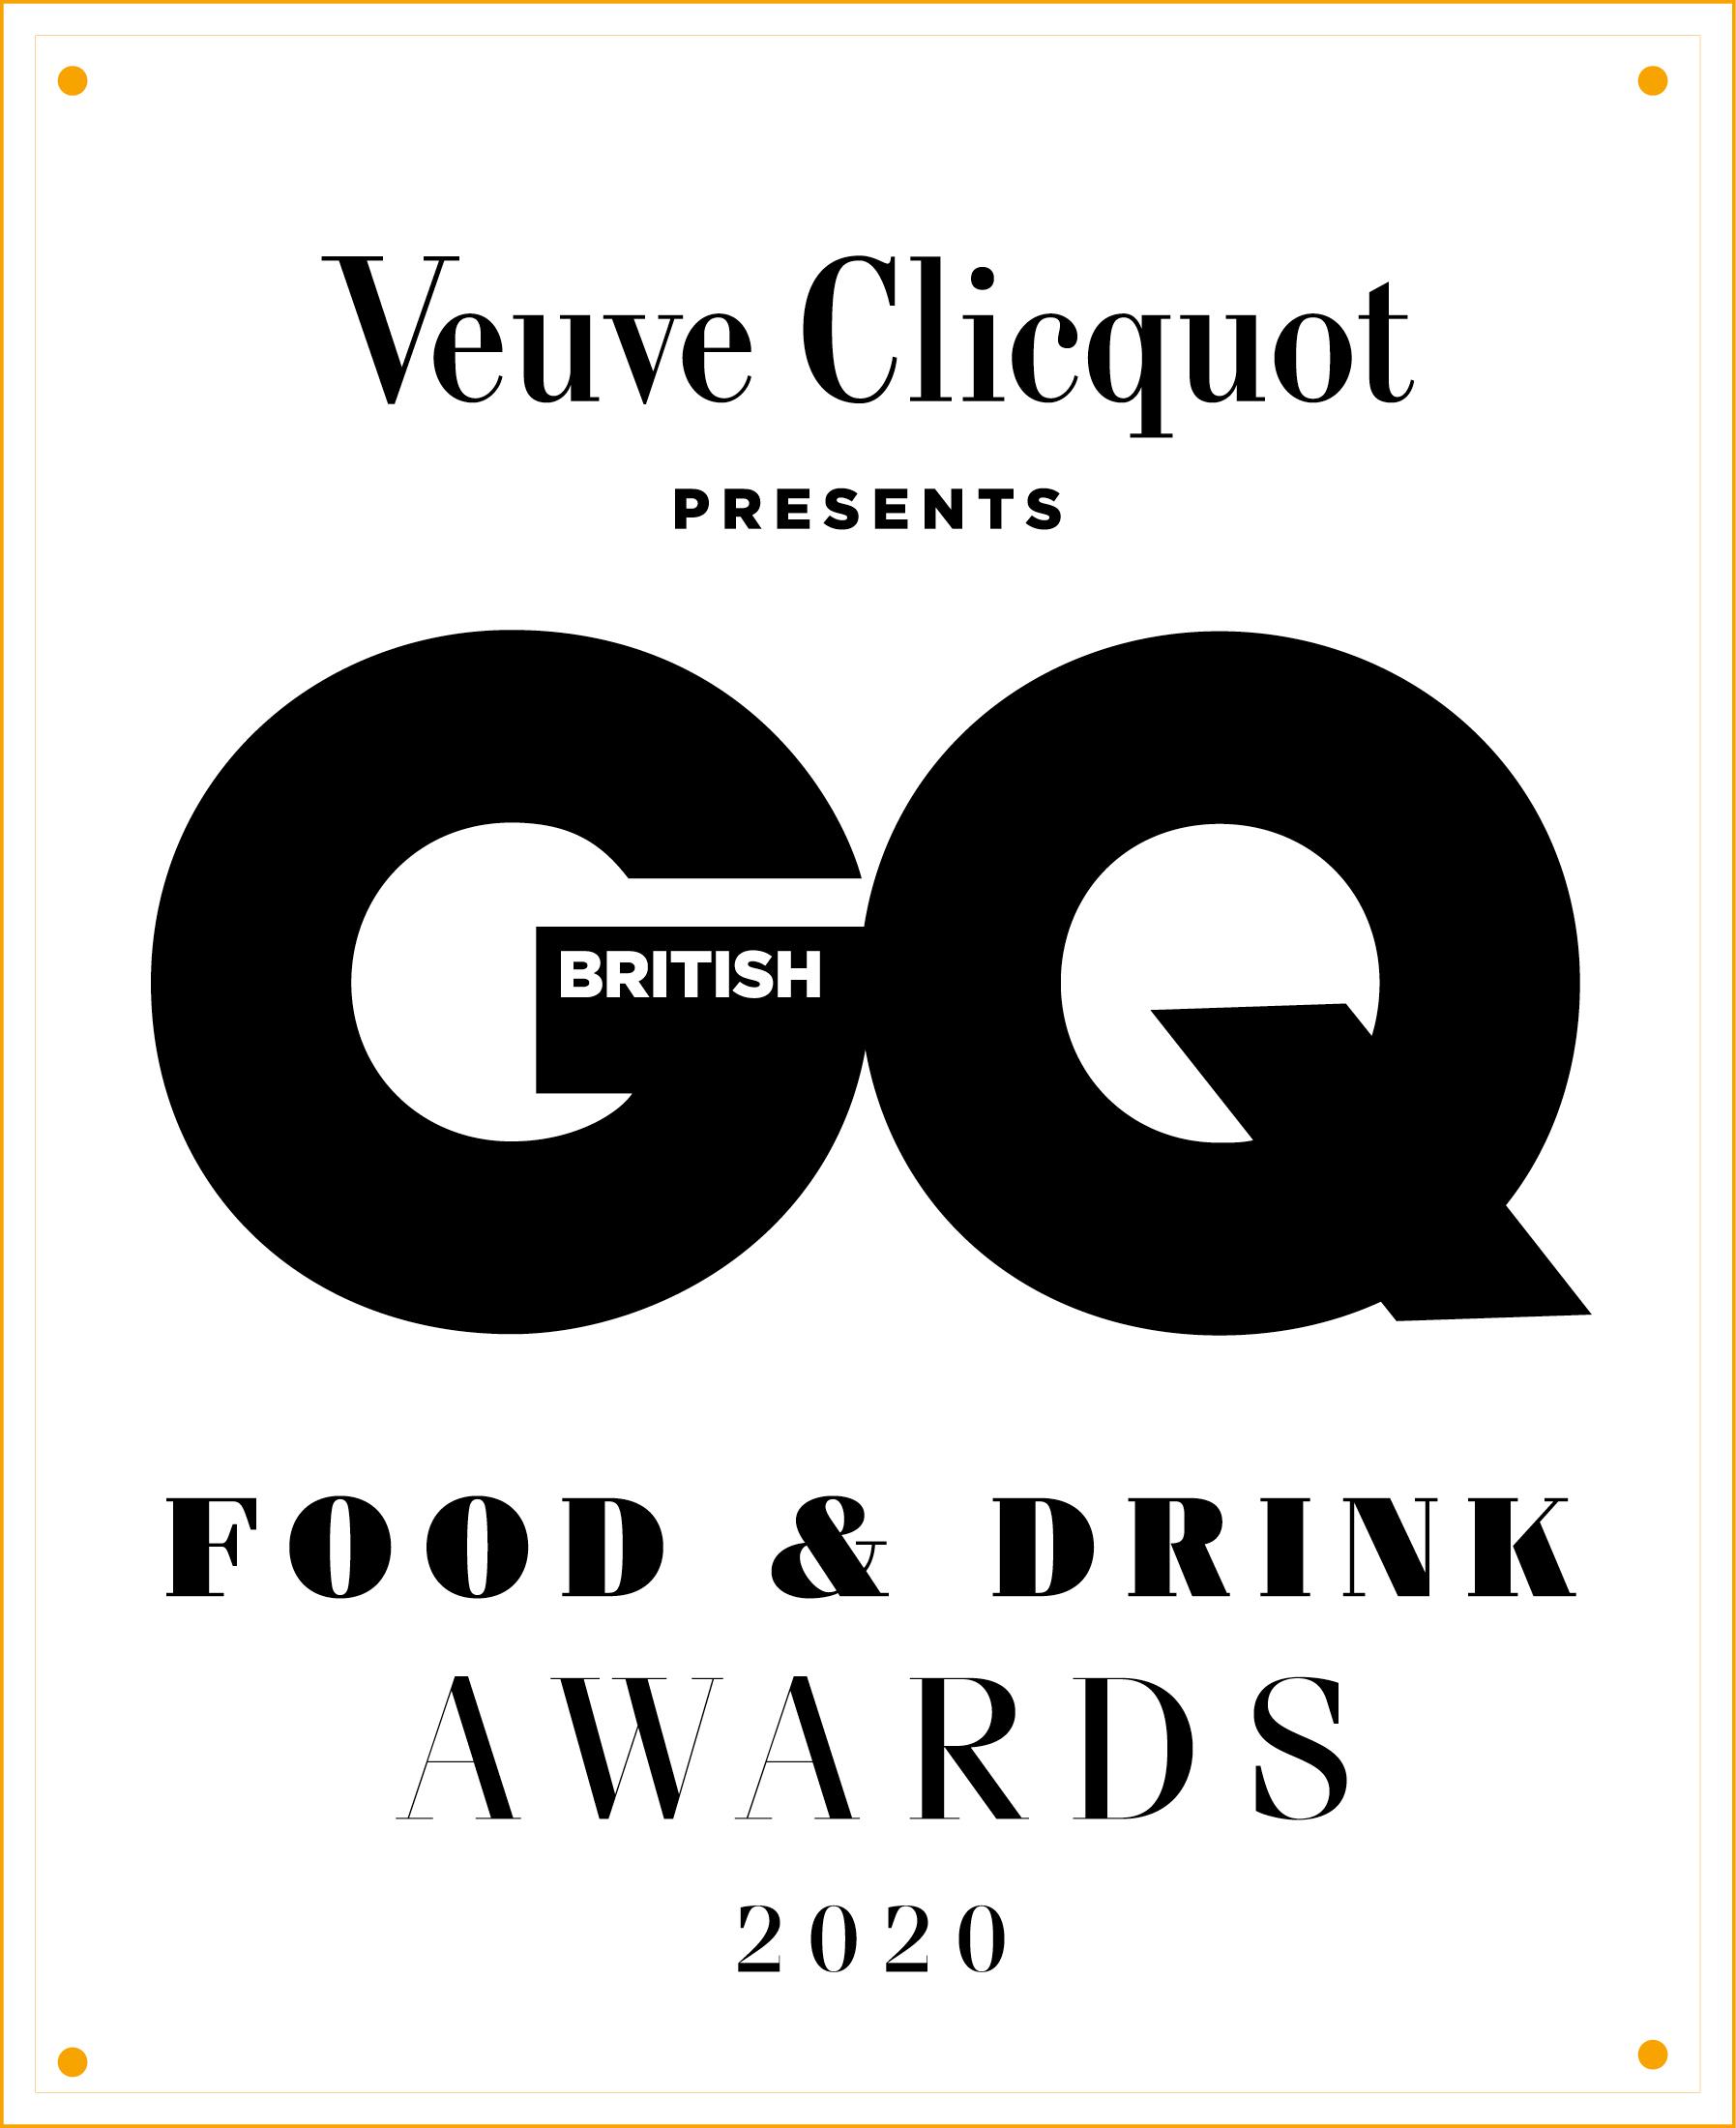 F&DAwardsLogo 2020 - Michelle Russell - UK - Food and Drink Awards - Sponsor 1